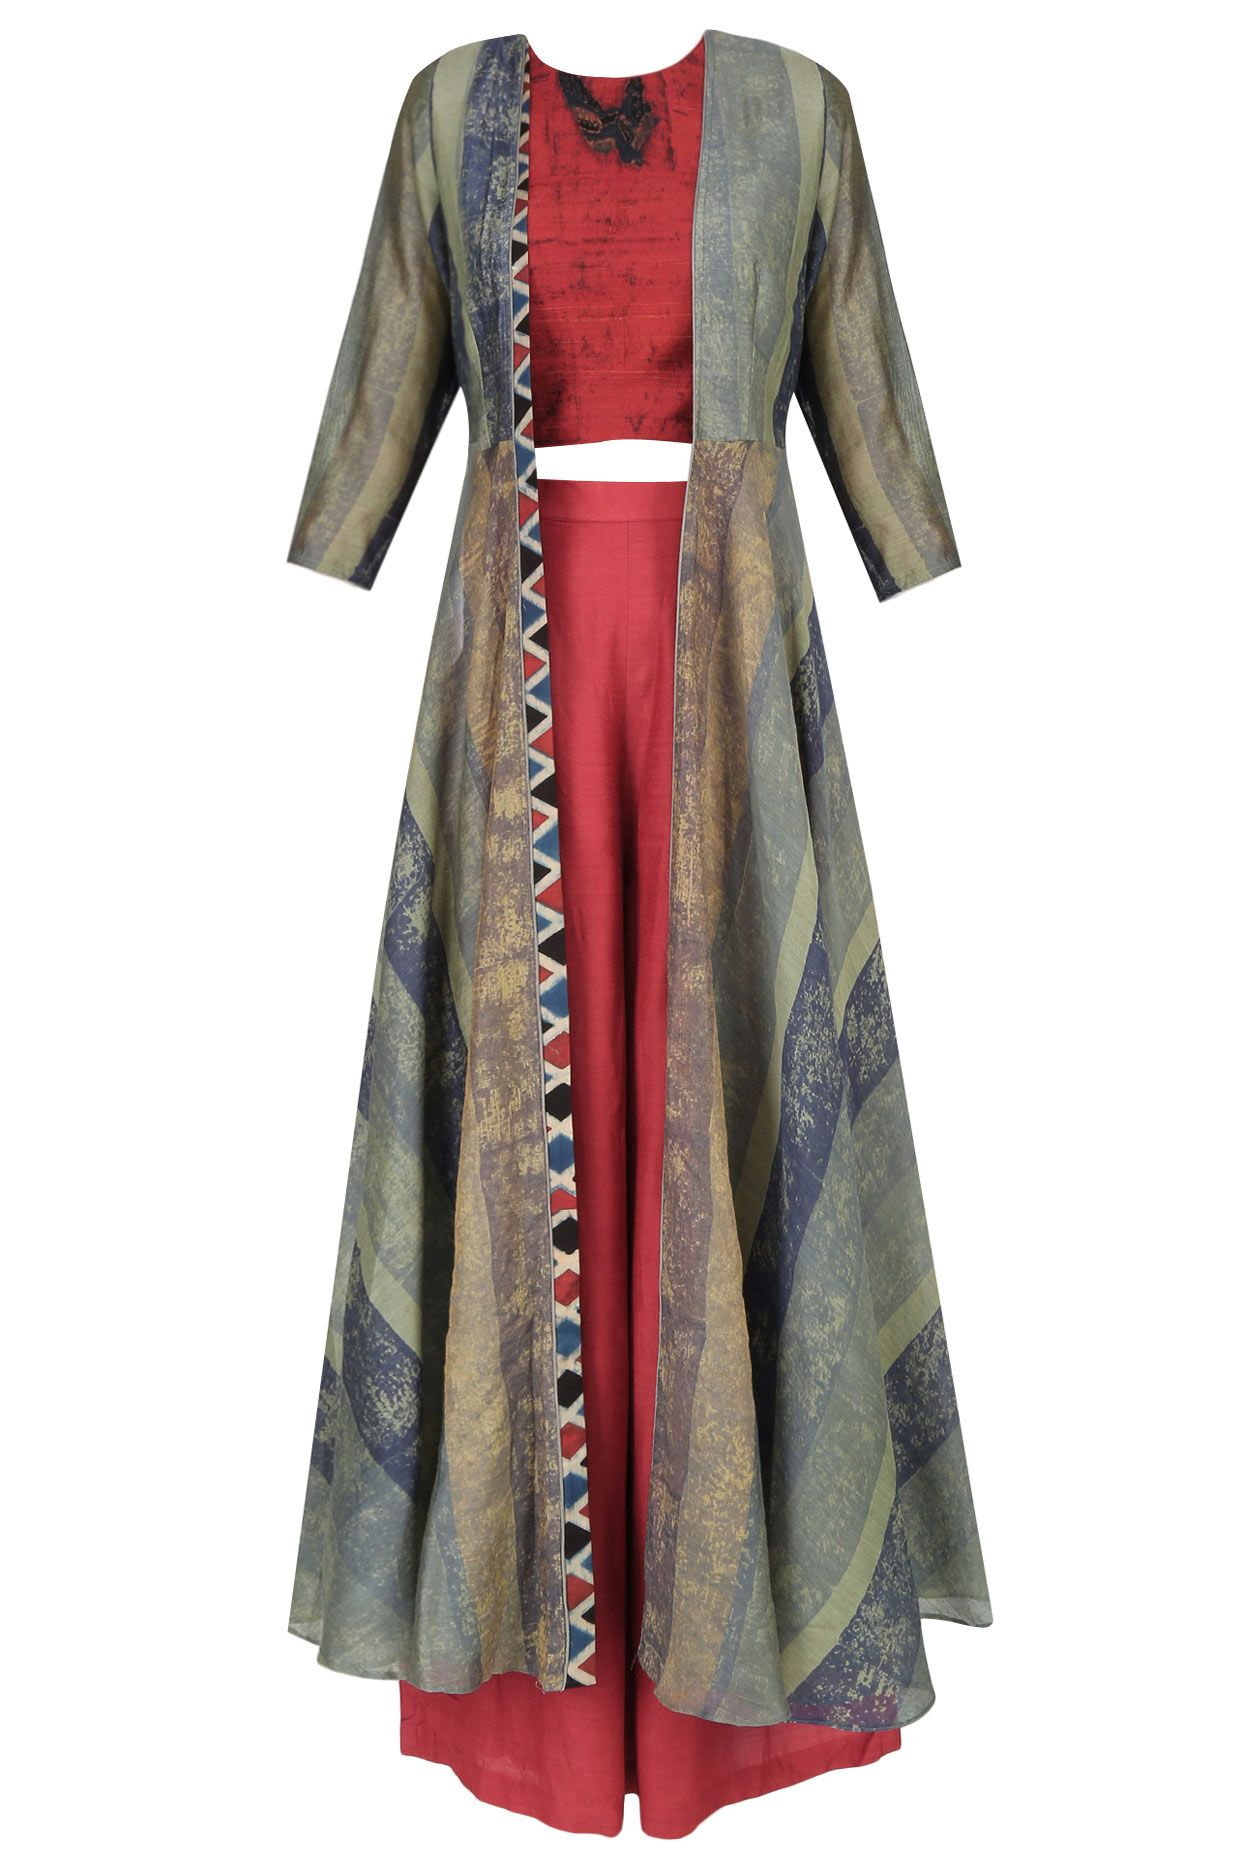 Shirt design with palazzo - Buy Anushree Designer Dresses Cape Set Palazzo Pants Skirts Set Jumpsuits Online From Perniaspopupshop Fashion Store Shop Now